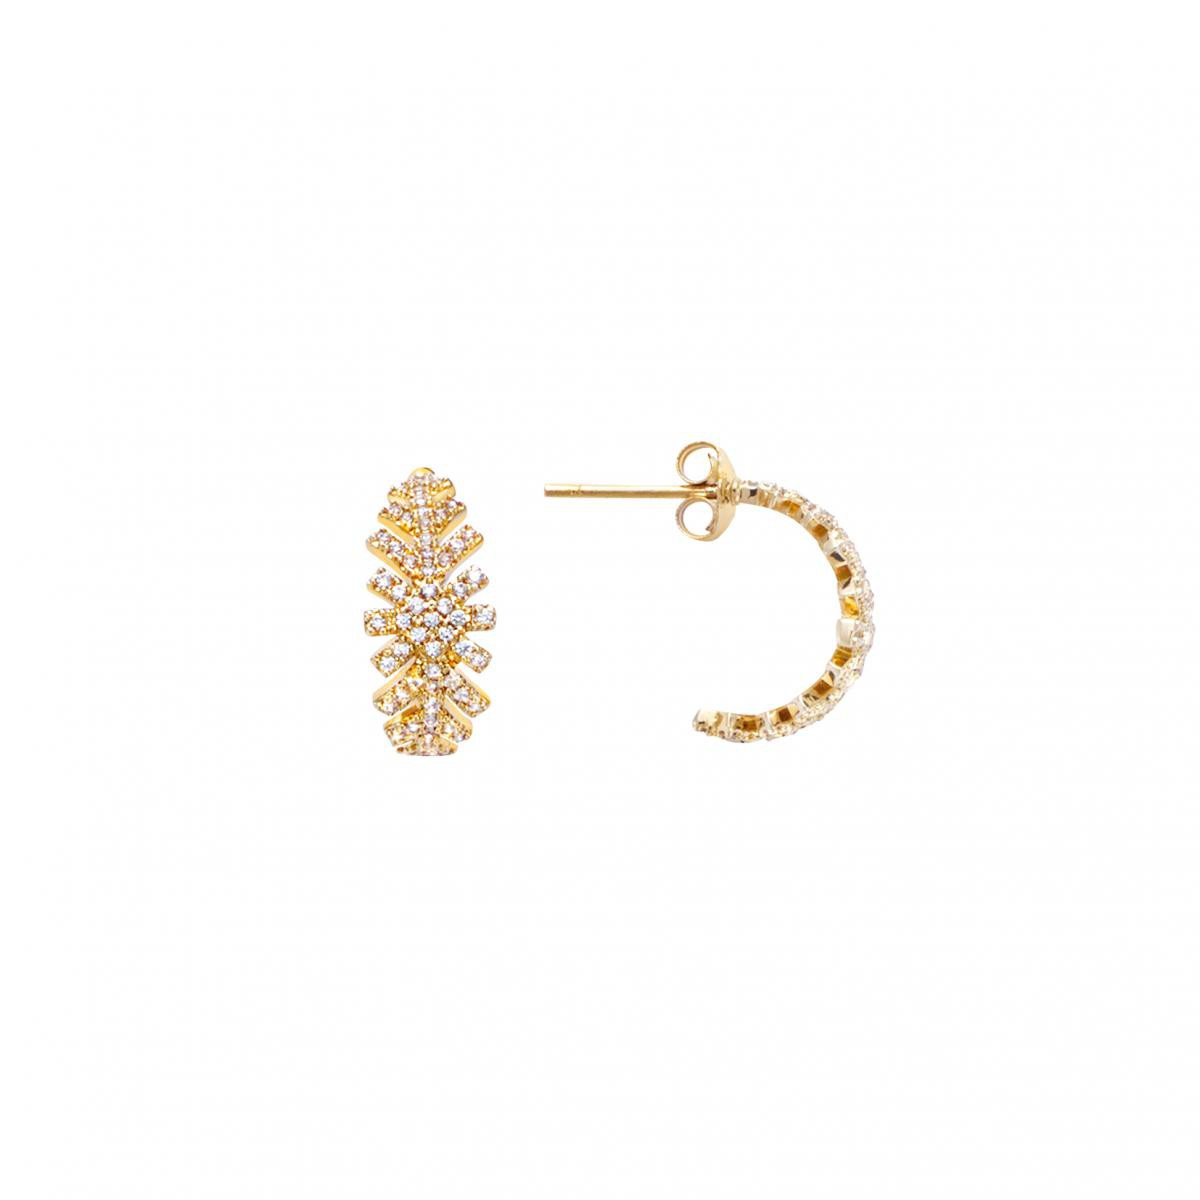 Boucles d'oreilles Bijoux 606530  - Go Mademoiselle - Modalova